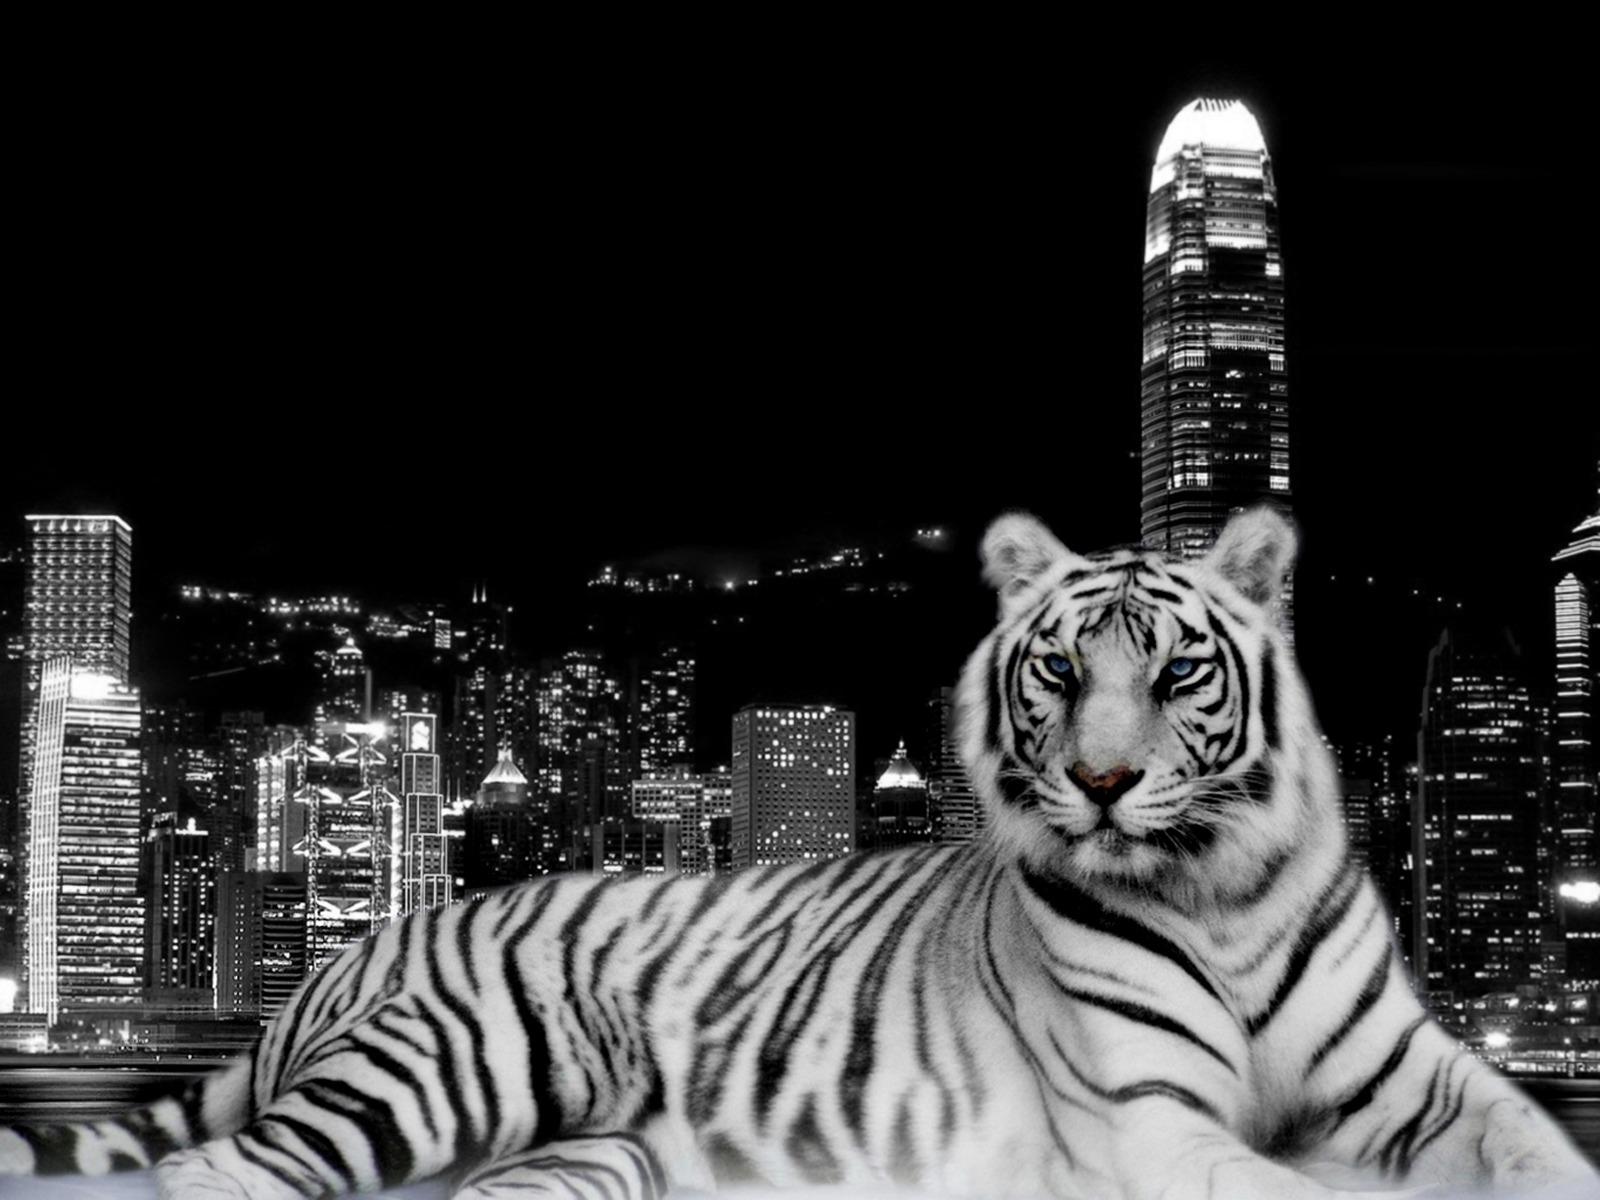 tiger deskto